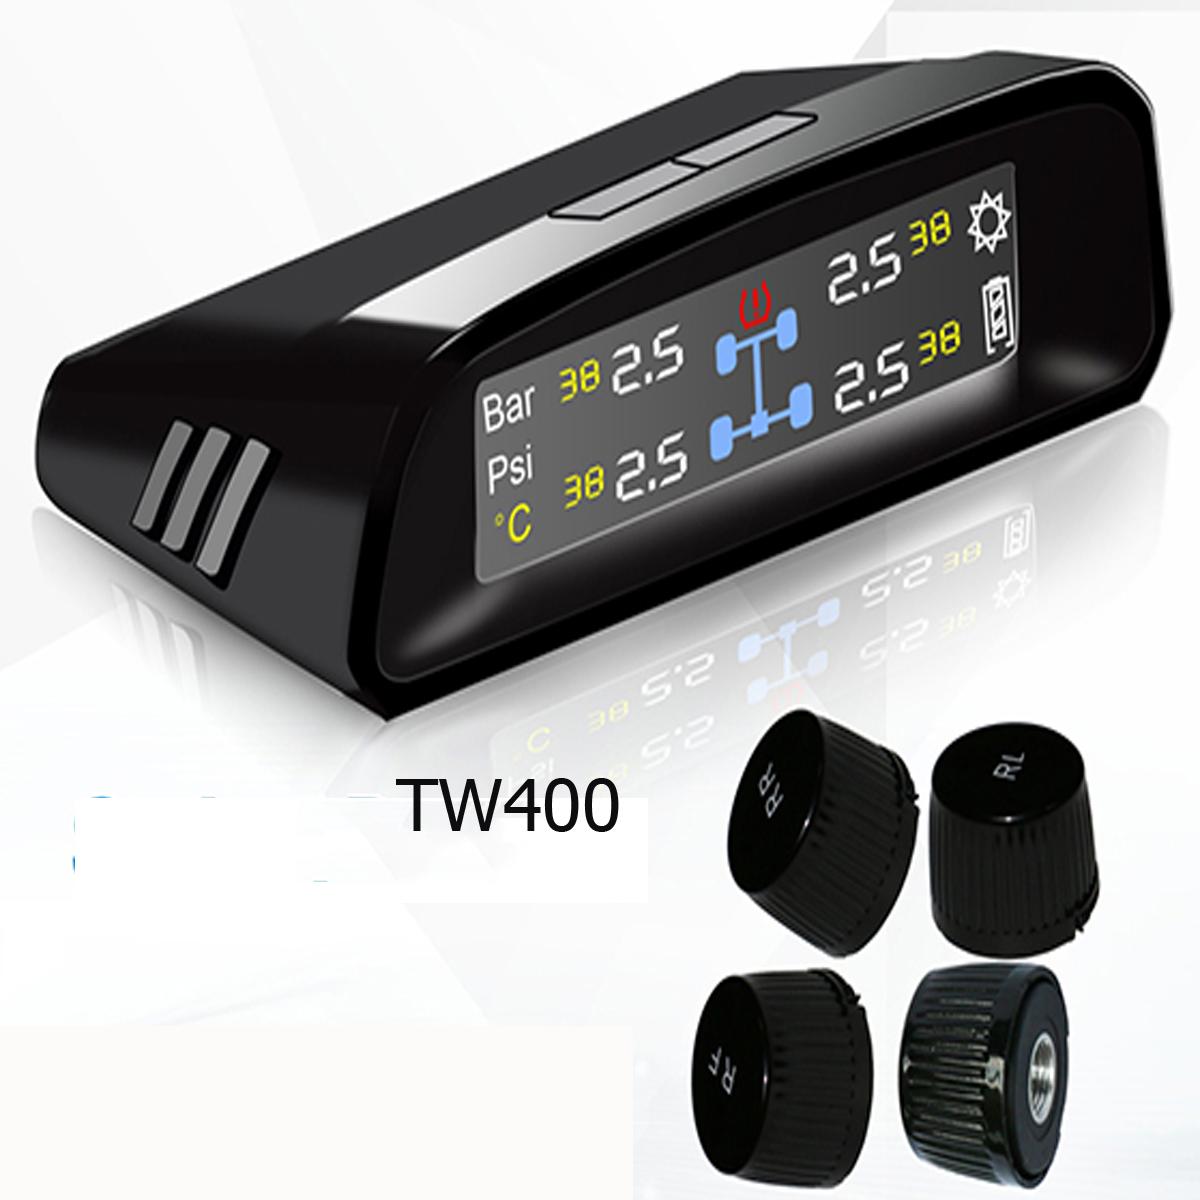 CẢM BIẾN ÁP SUẤT LỐP TPMS TW400